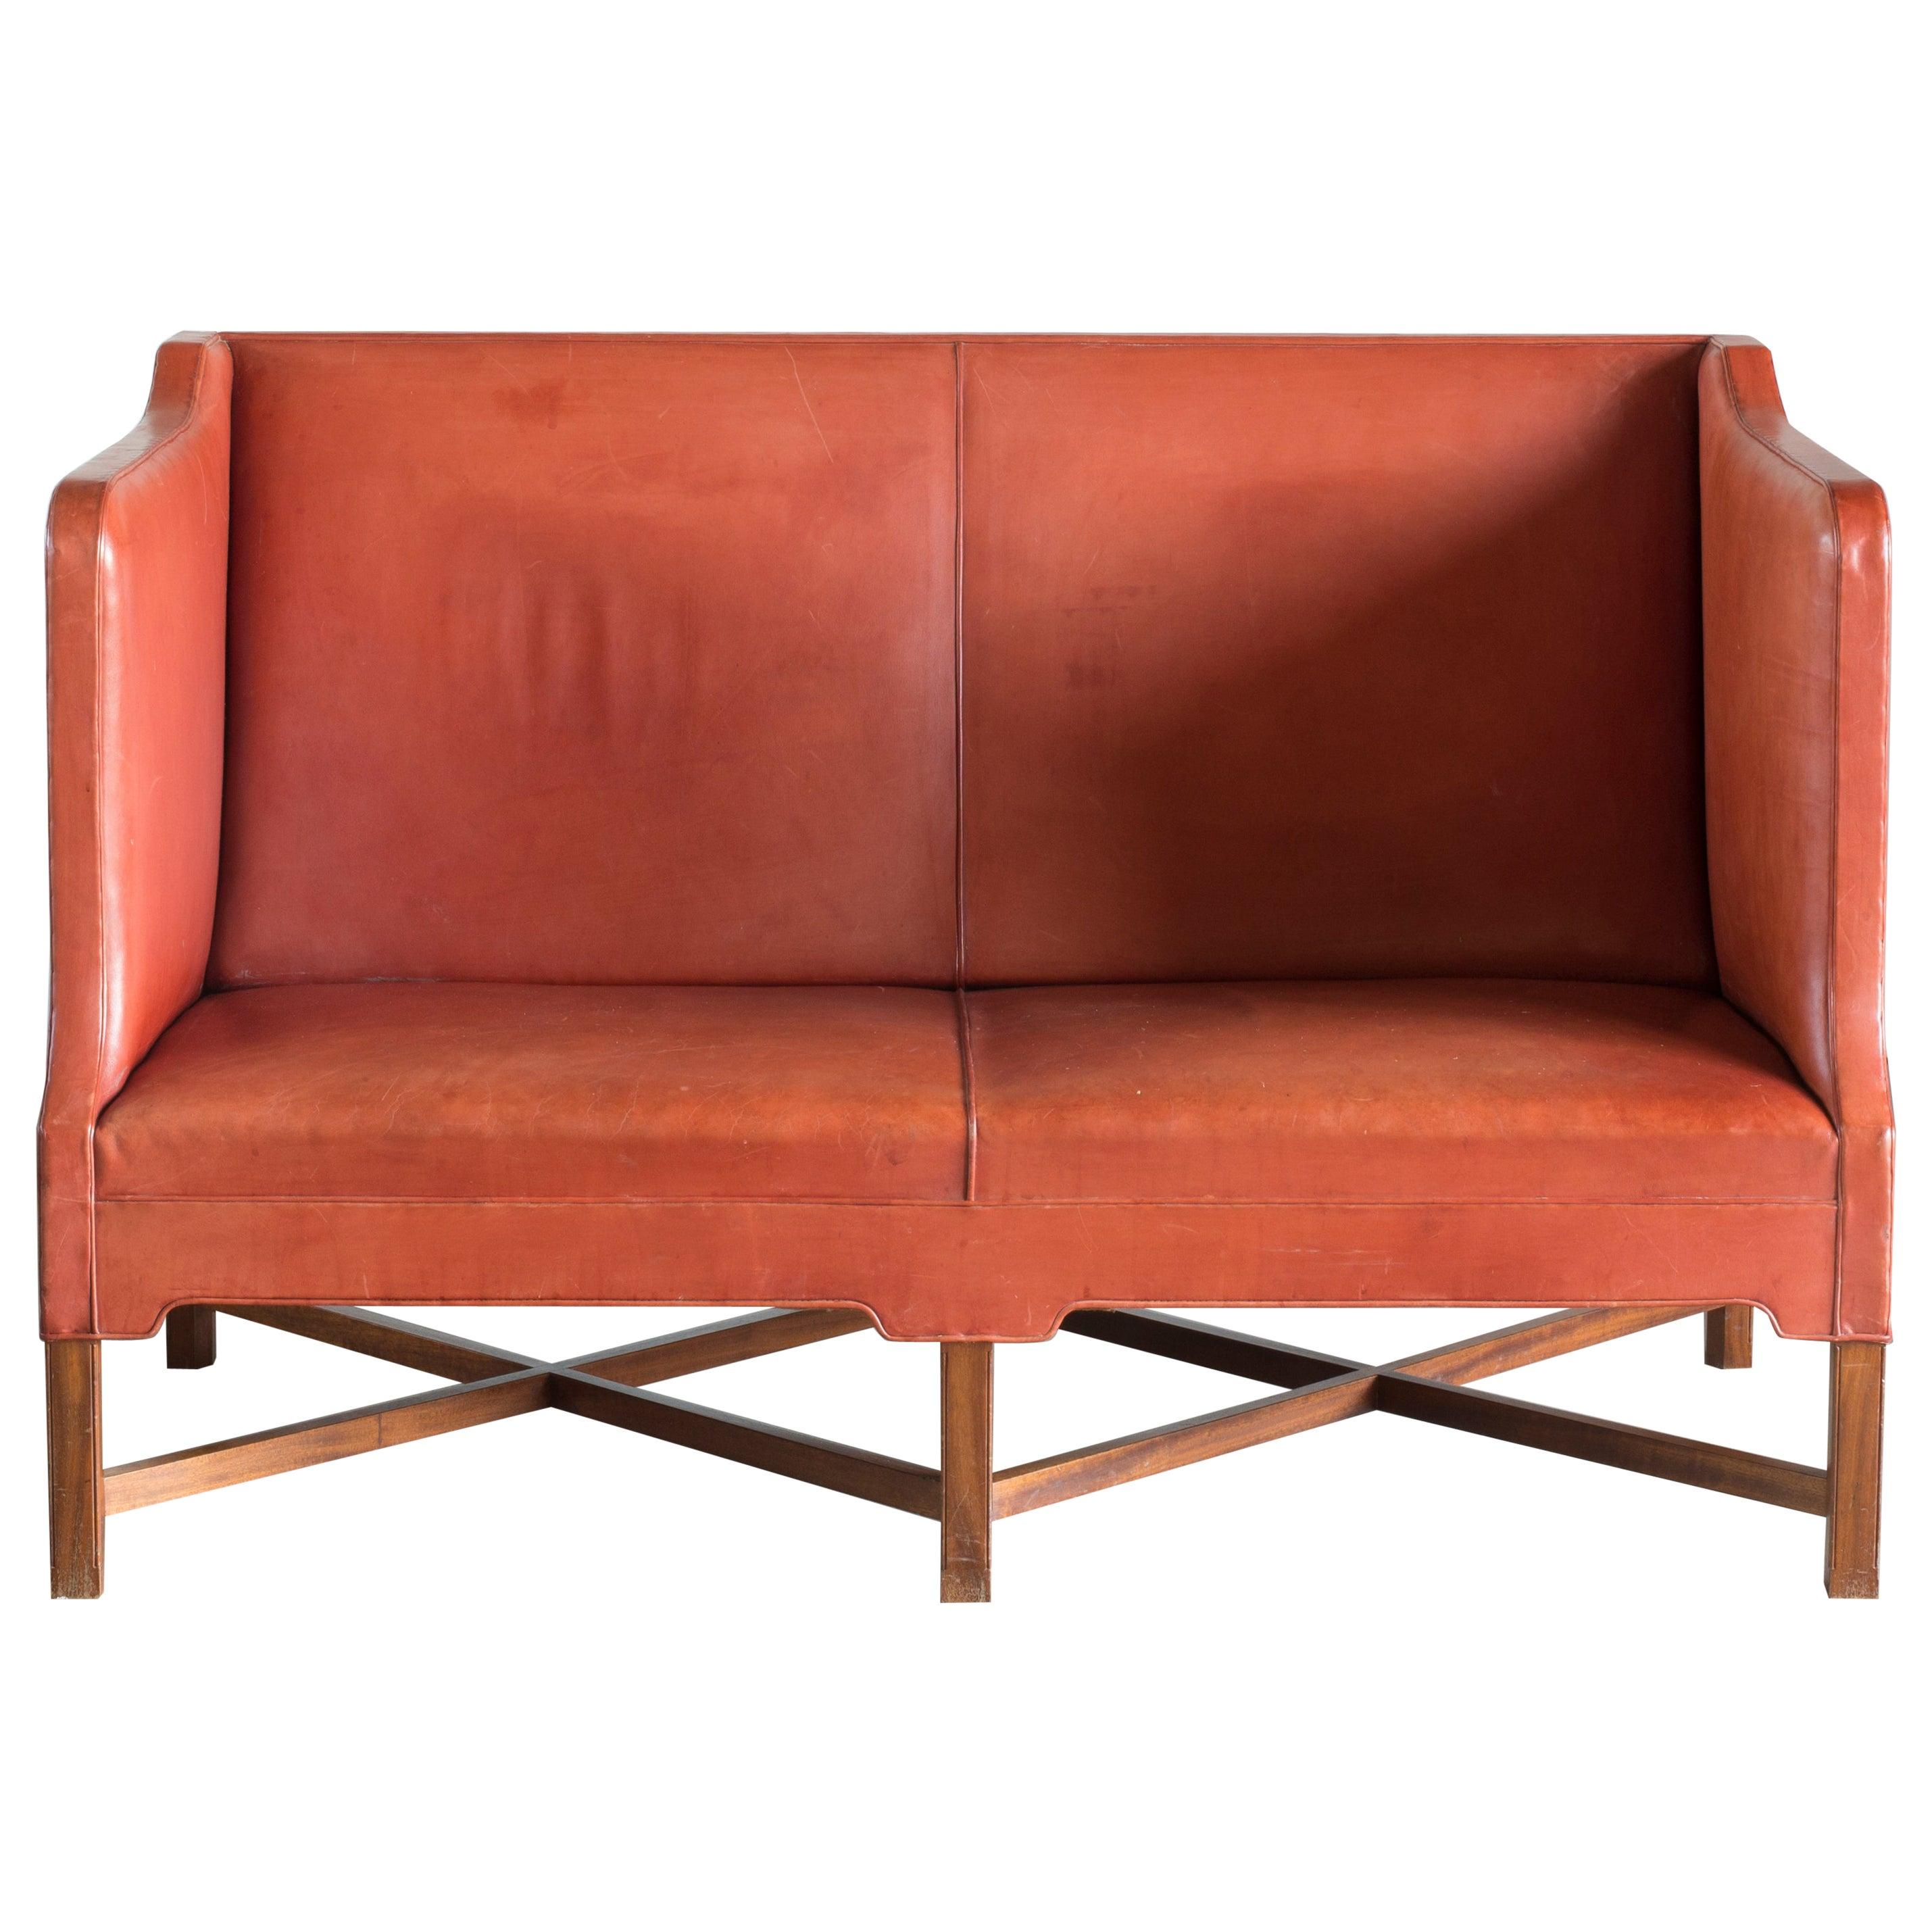 Kaare Klint Two-Seat Sofa for Rud. Rasmussen